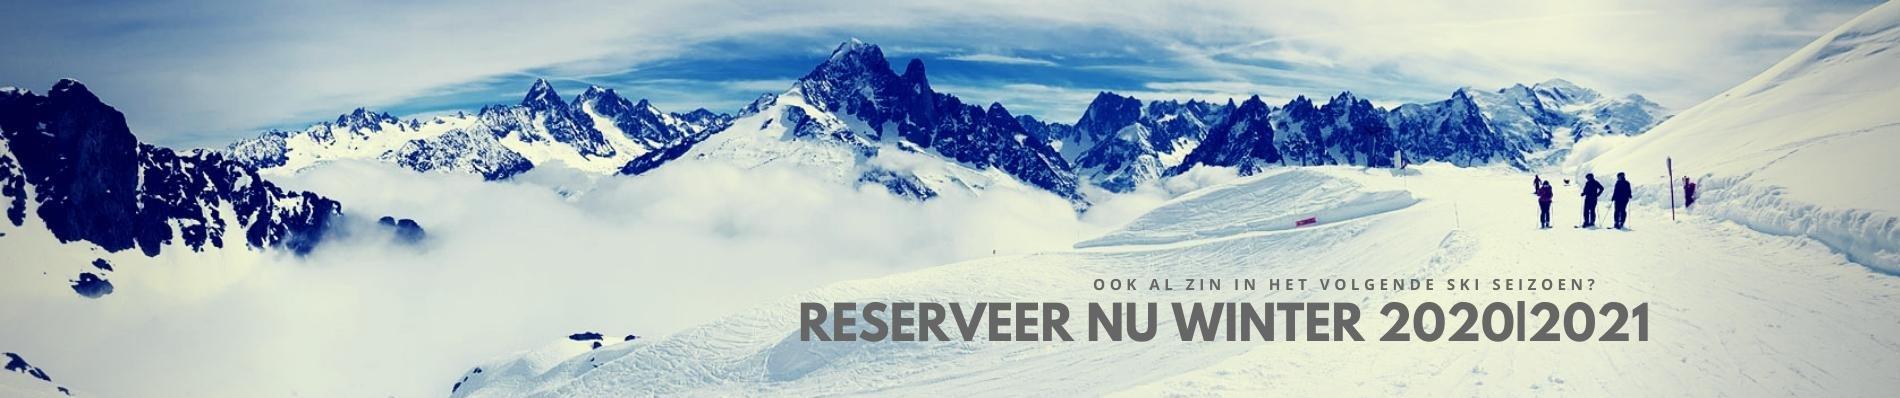 Skiseizoen 2020 2021